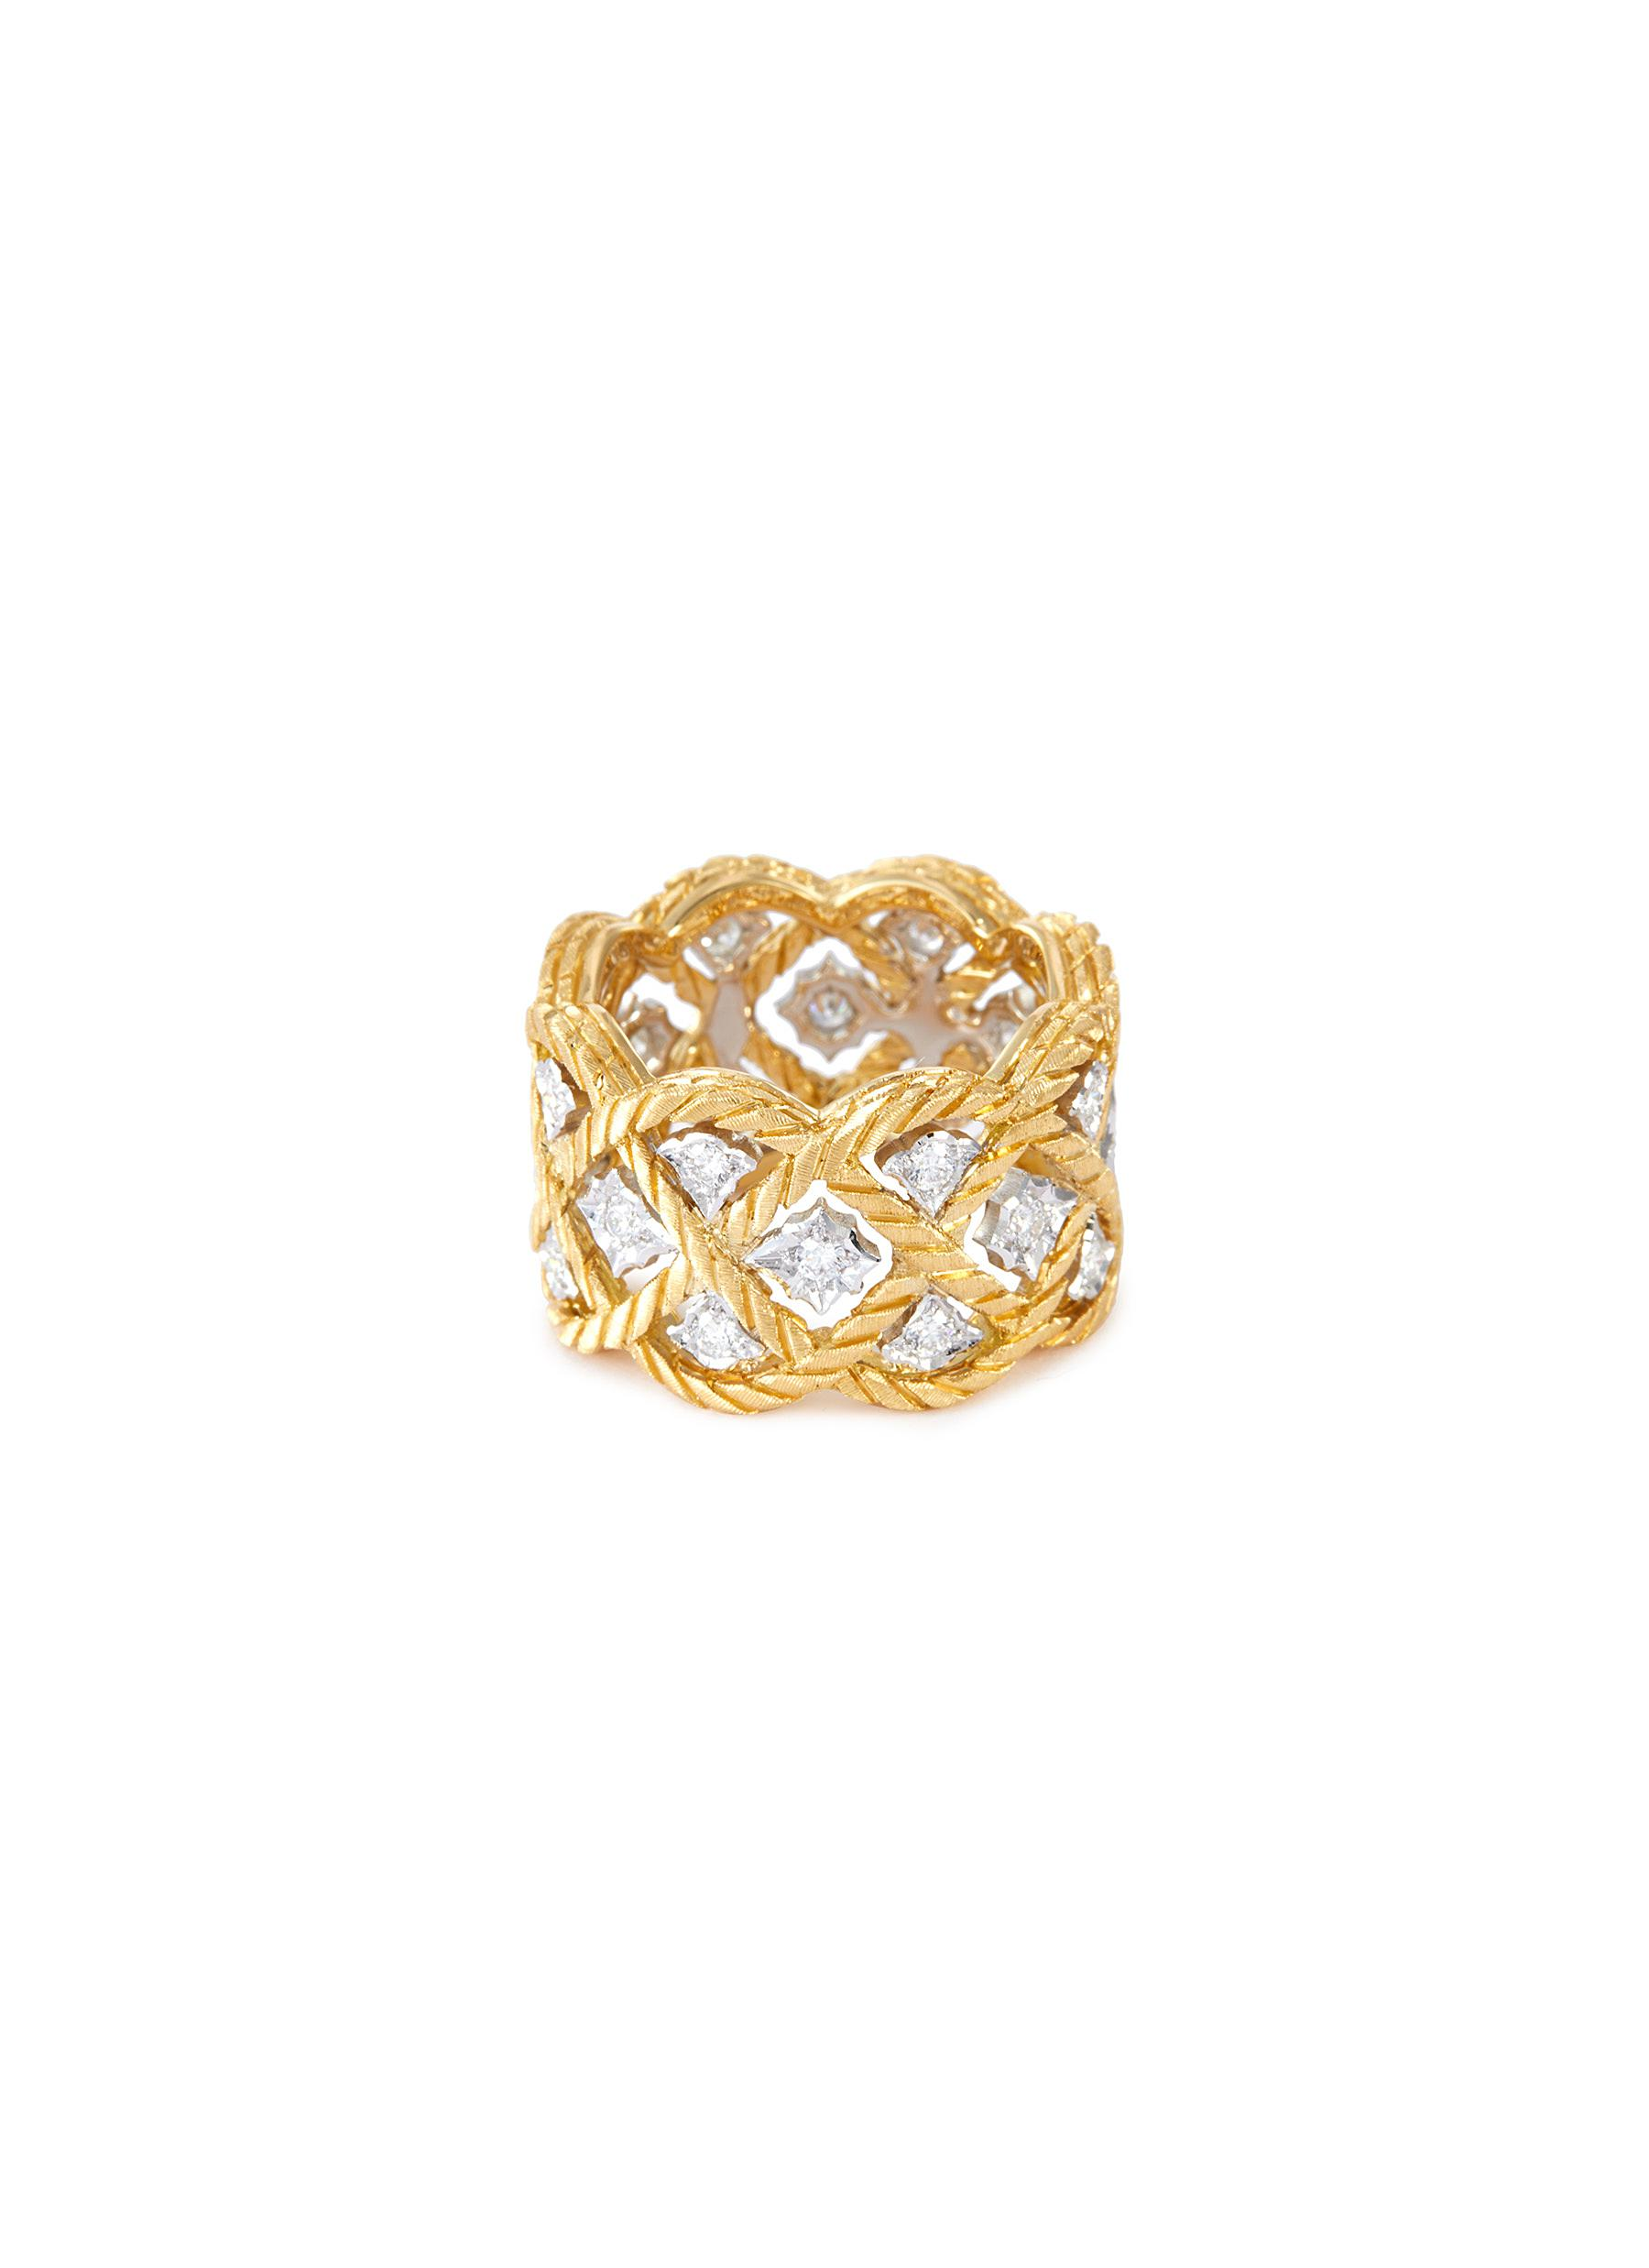 'Étoilée' diamond yellow gold lattice ring